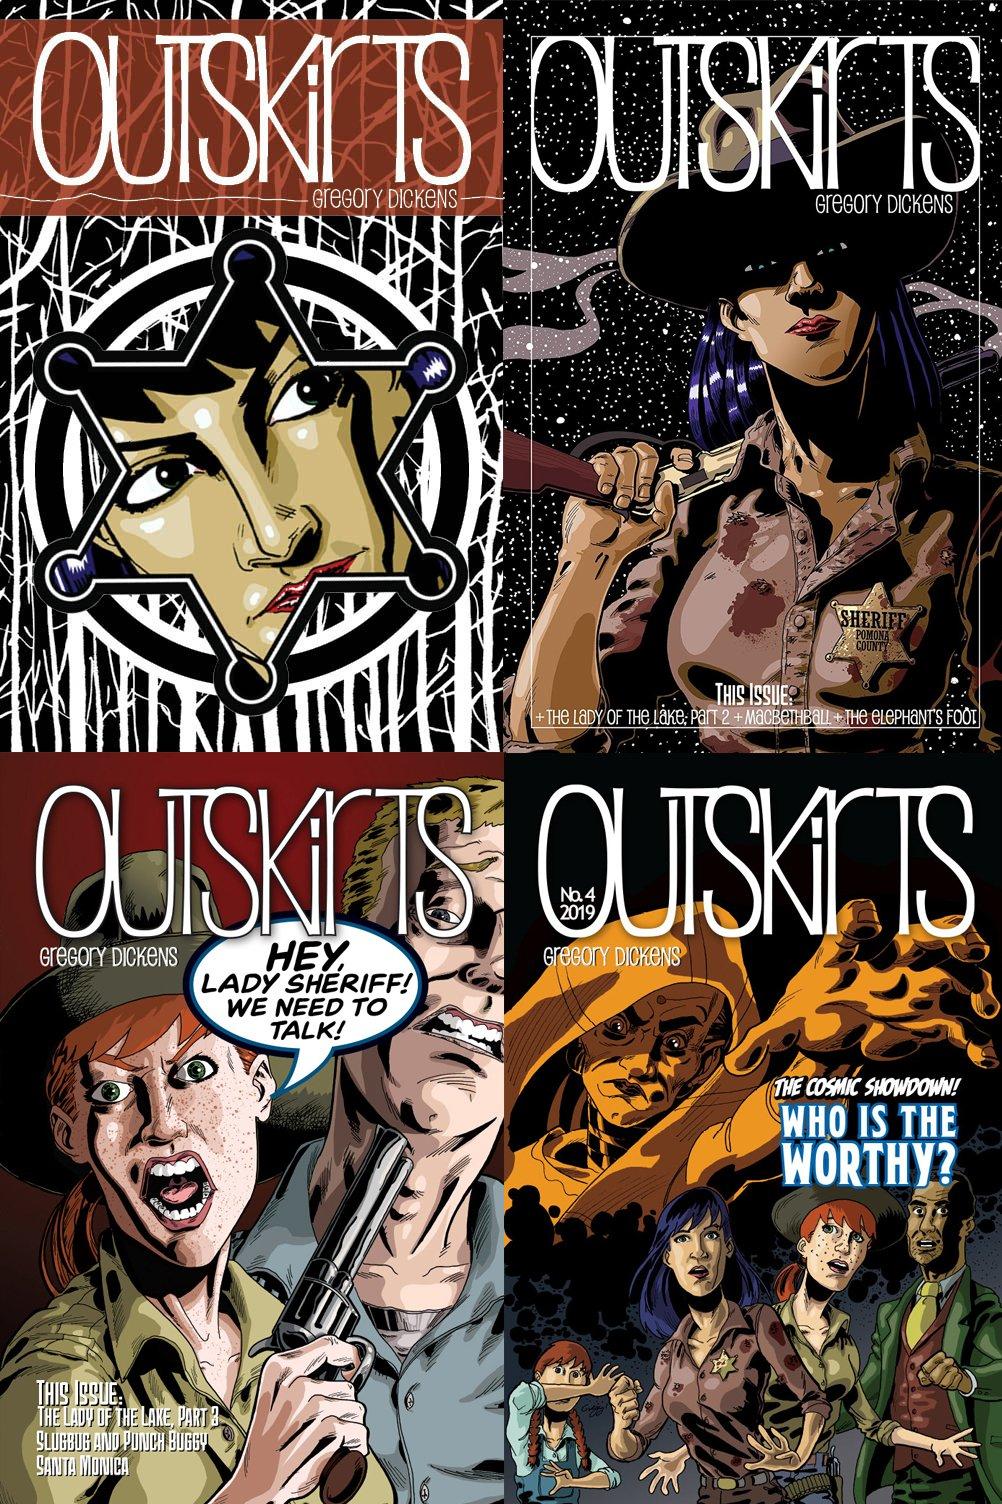 Image of Outskirts 1 - 4